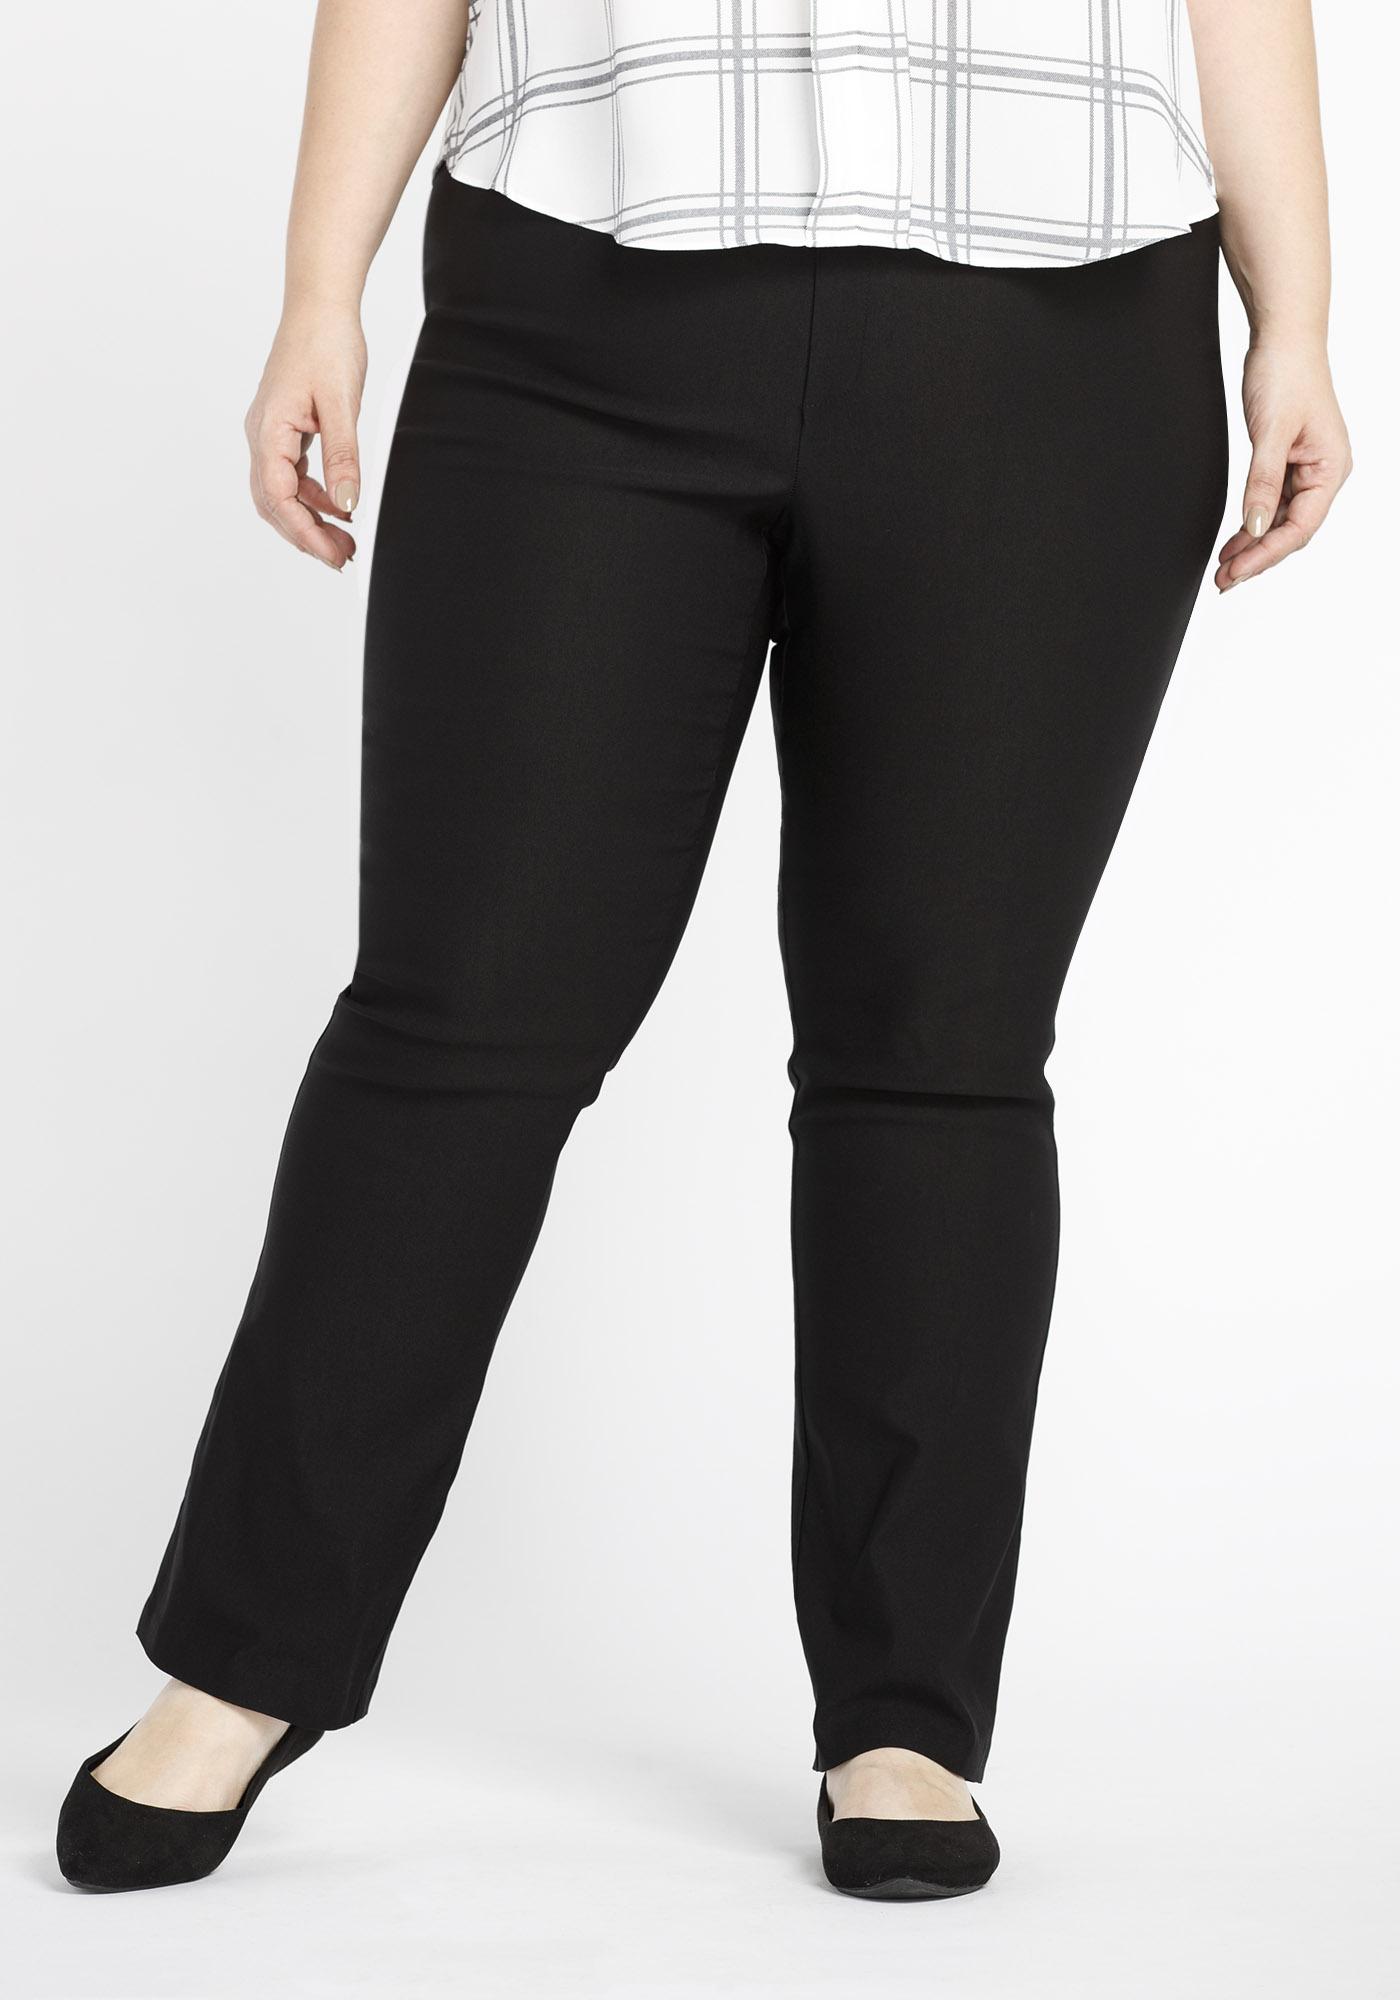 Women\'s Plus Size Slim Boot Dress Pants | Warehouse One